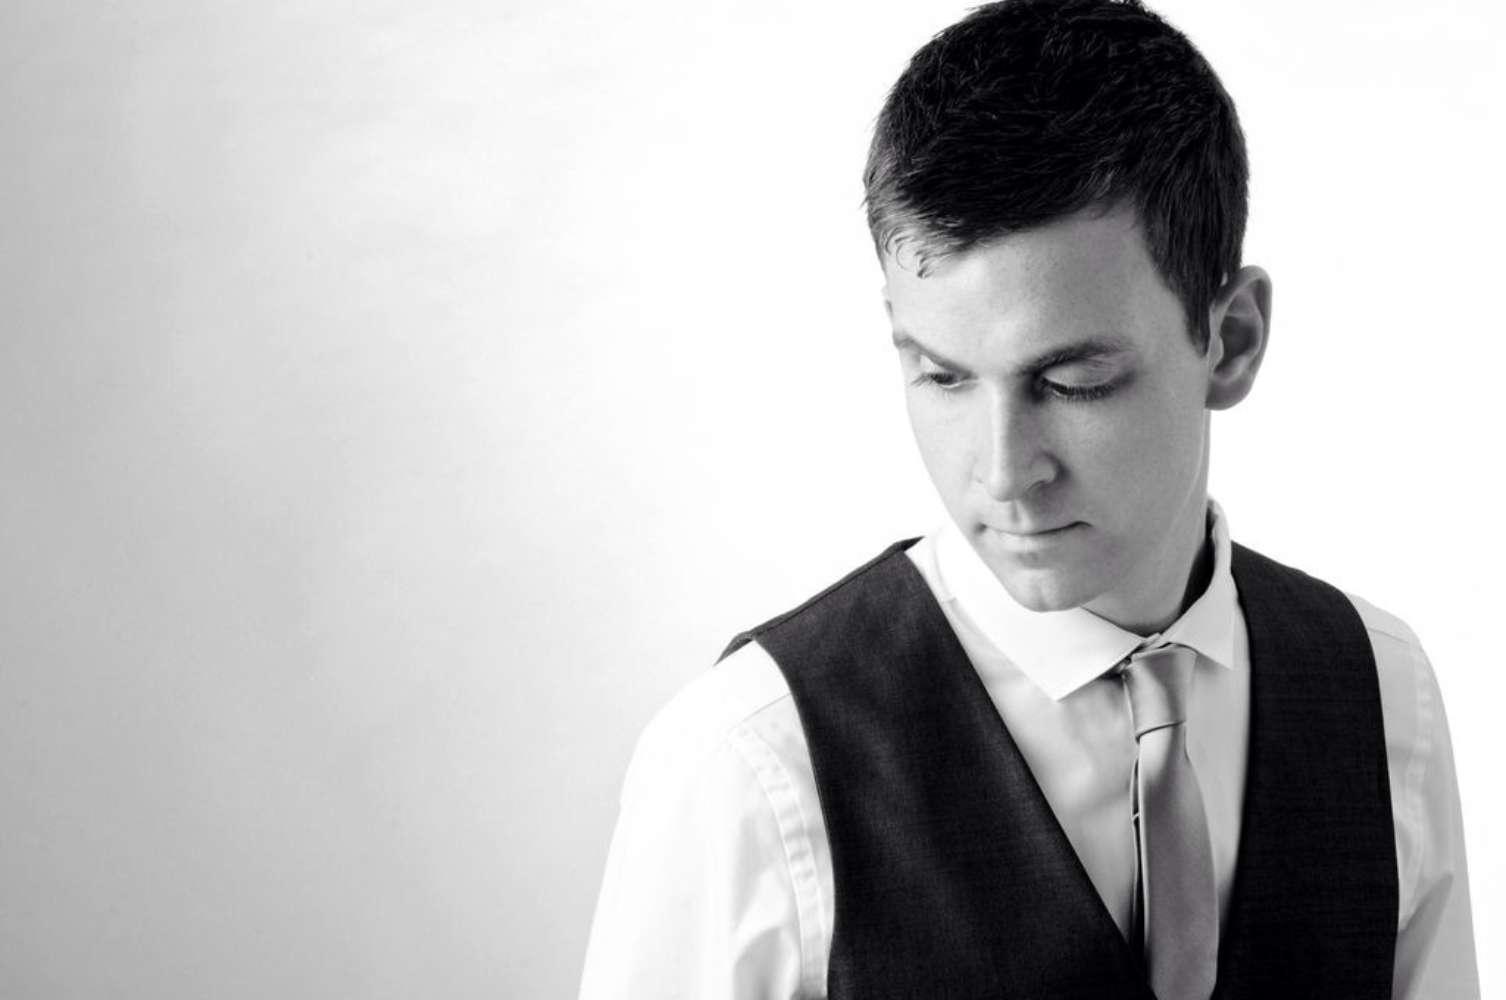 Andrew James Wedding Singer Liverpool Main